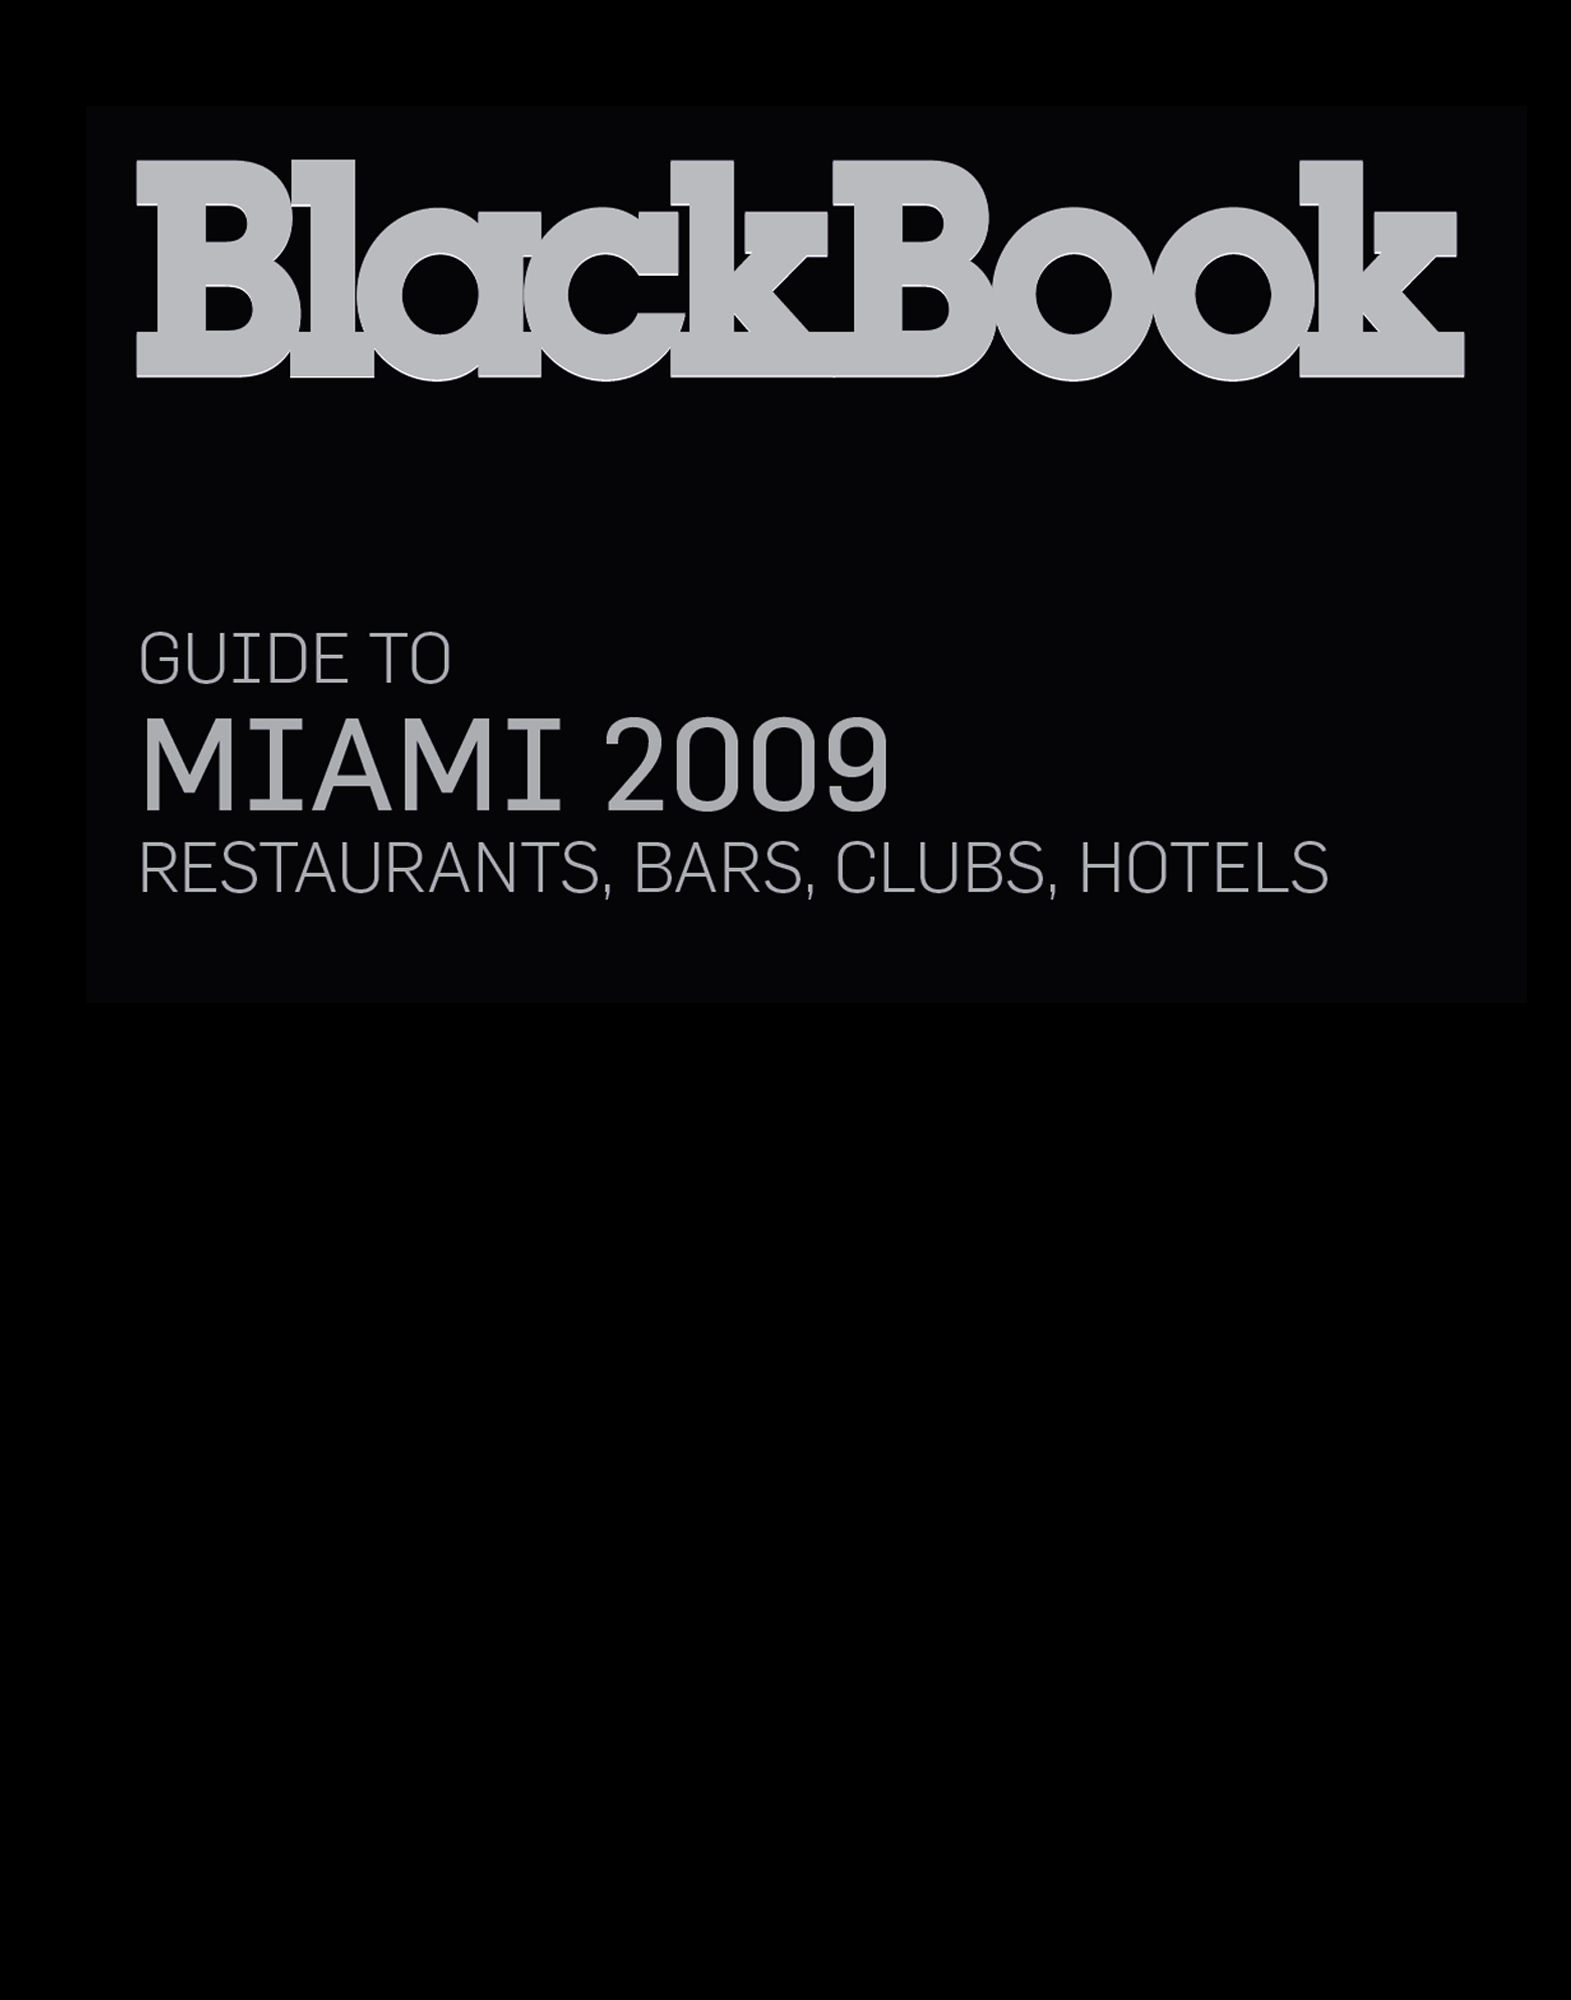 BLACKBOOK GUIDE LIFESTYLE  Item 56000500 1